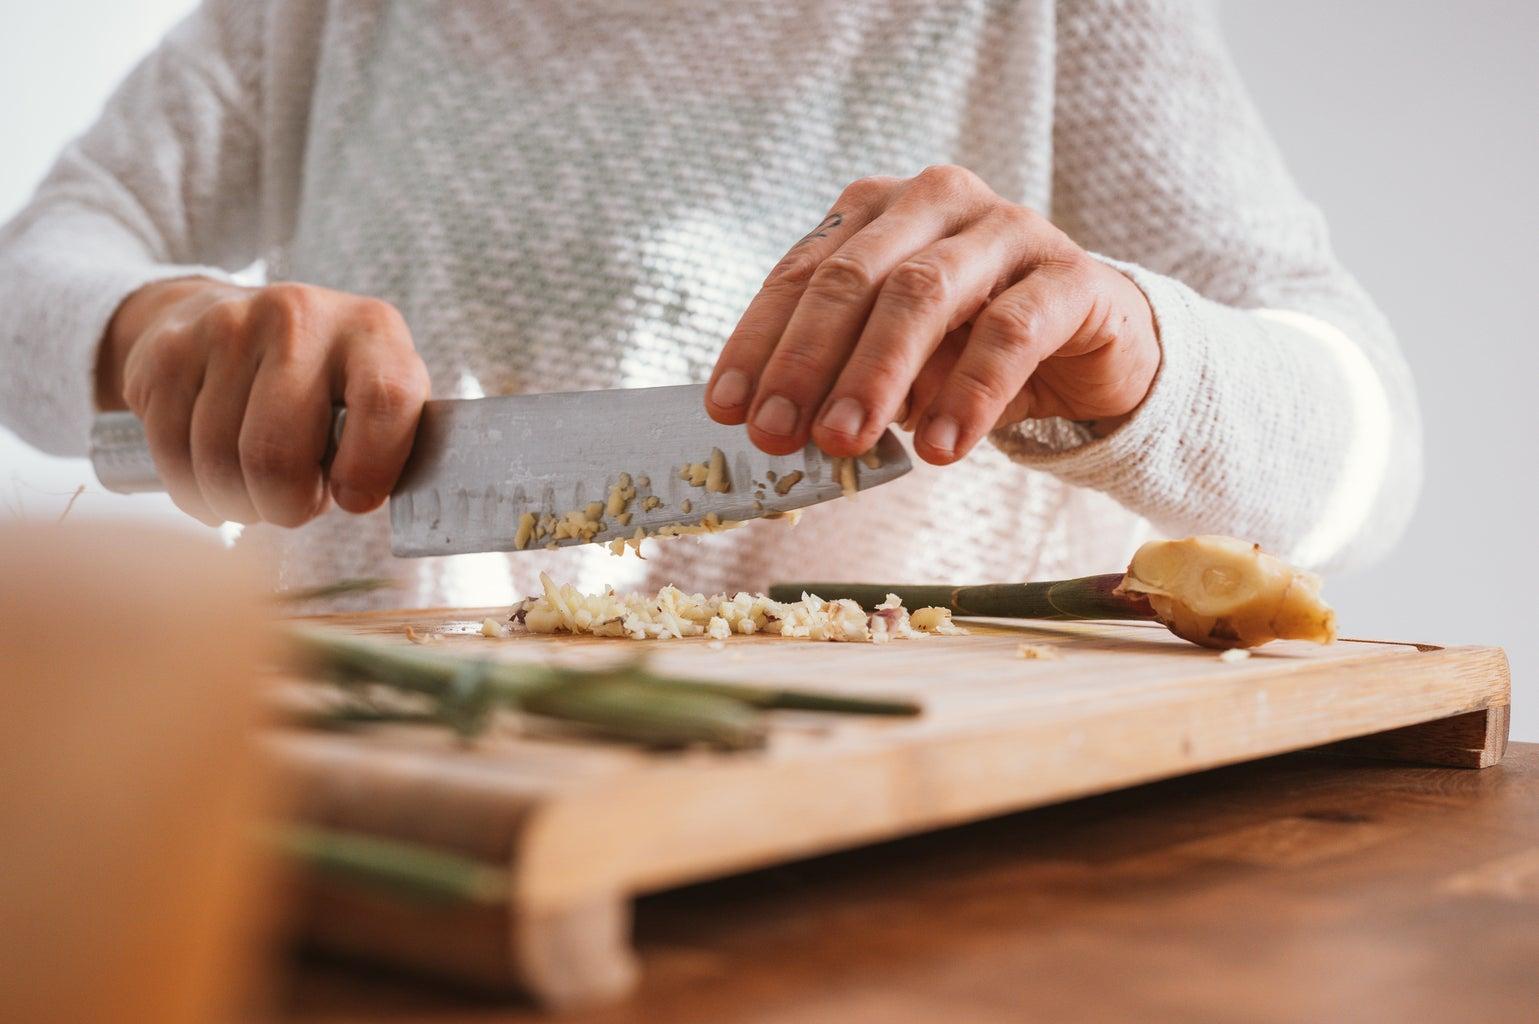 chopping food and food prep